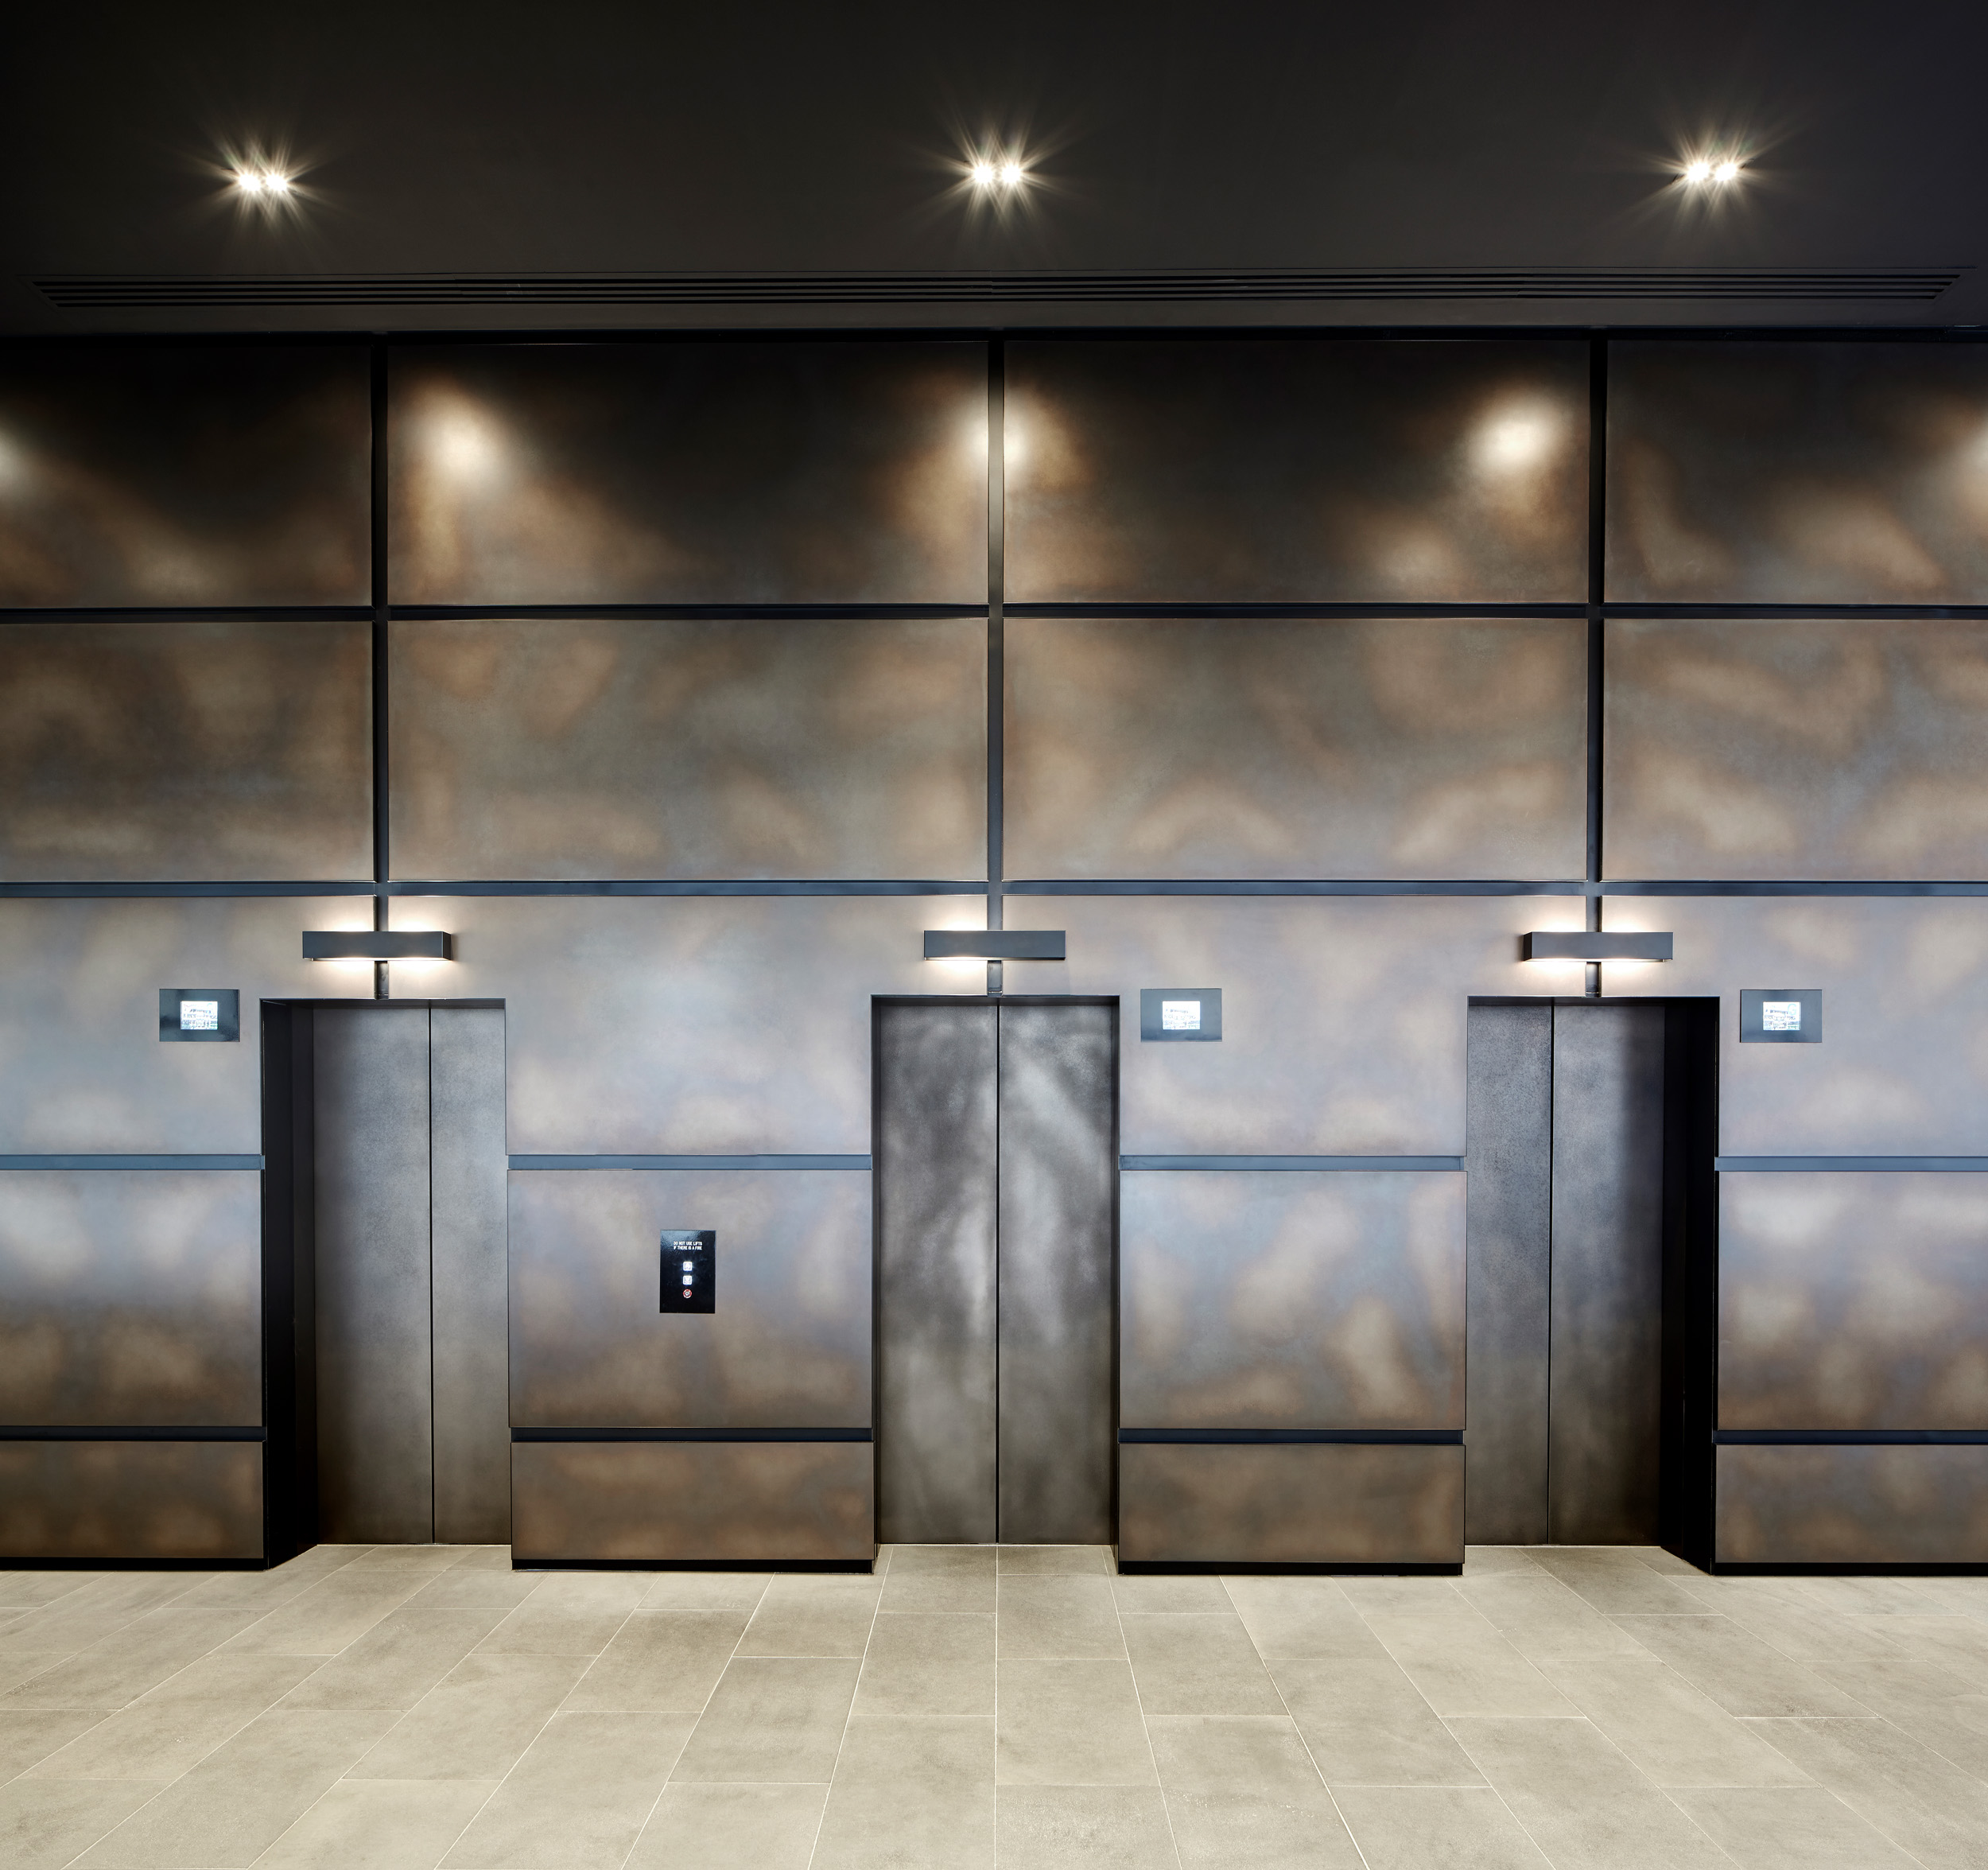 Jem_Cresswell_Architecture_Commercial_Photographer_Sydney_Australia_012.jpg